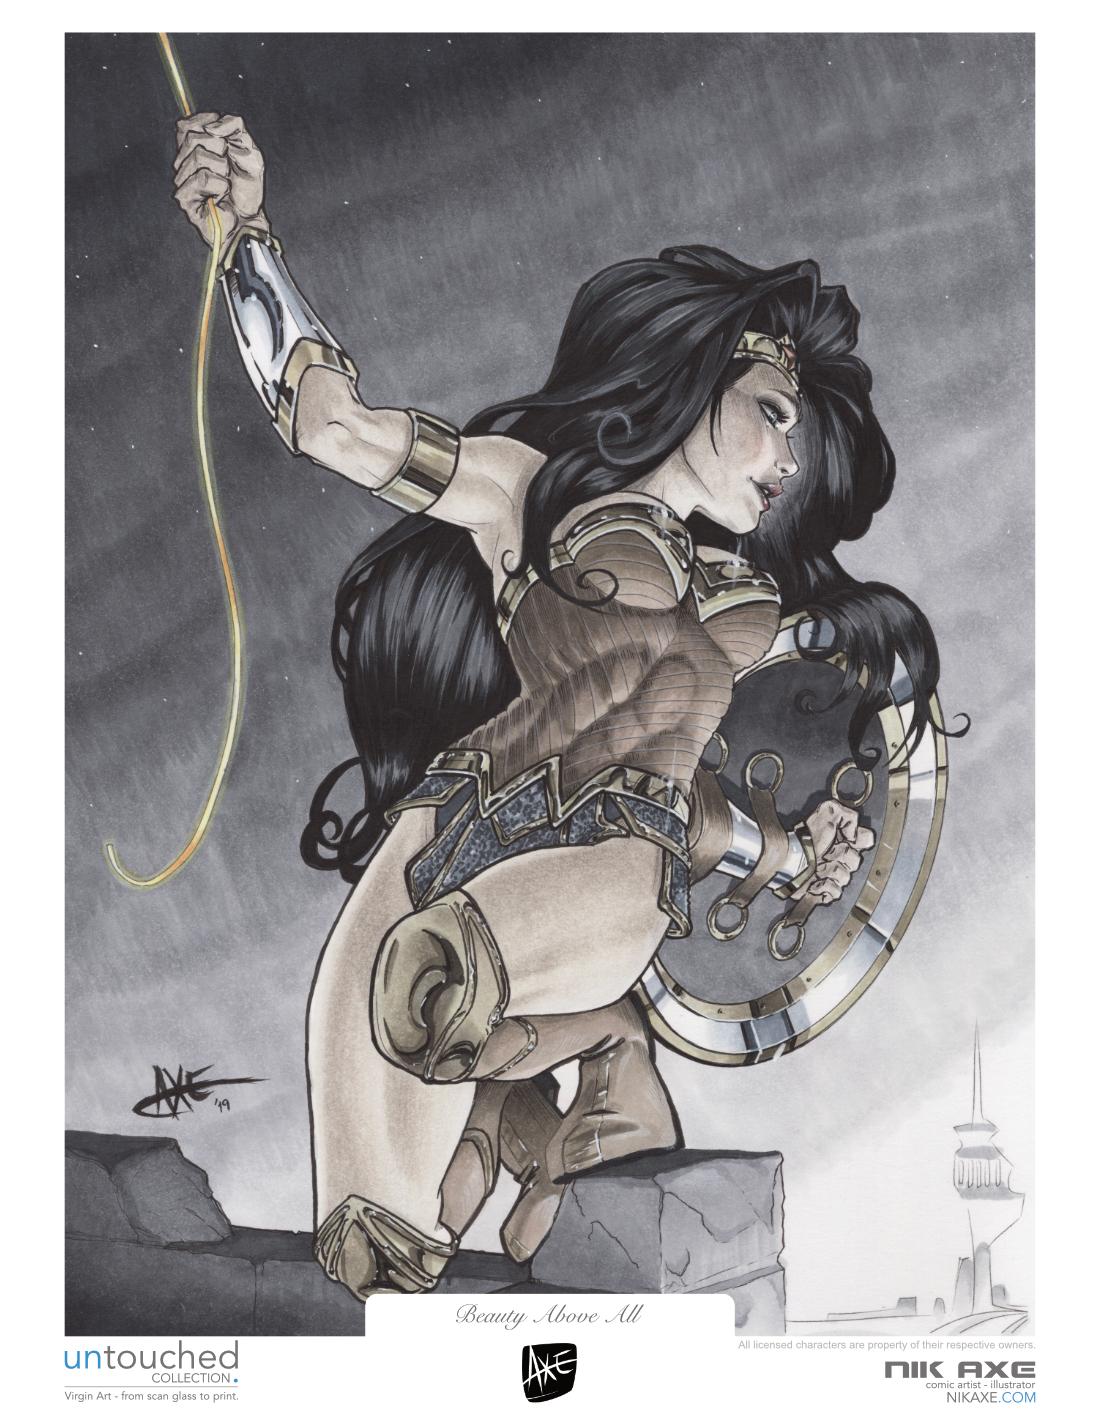 Wonder Woman Art Print Justice League DC Comics Beauty Above All